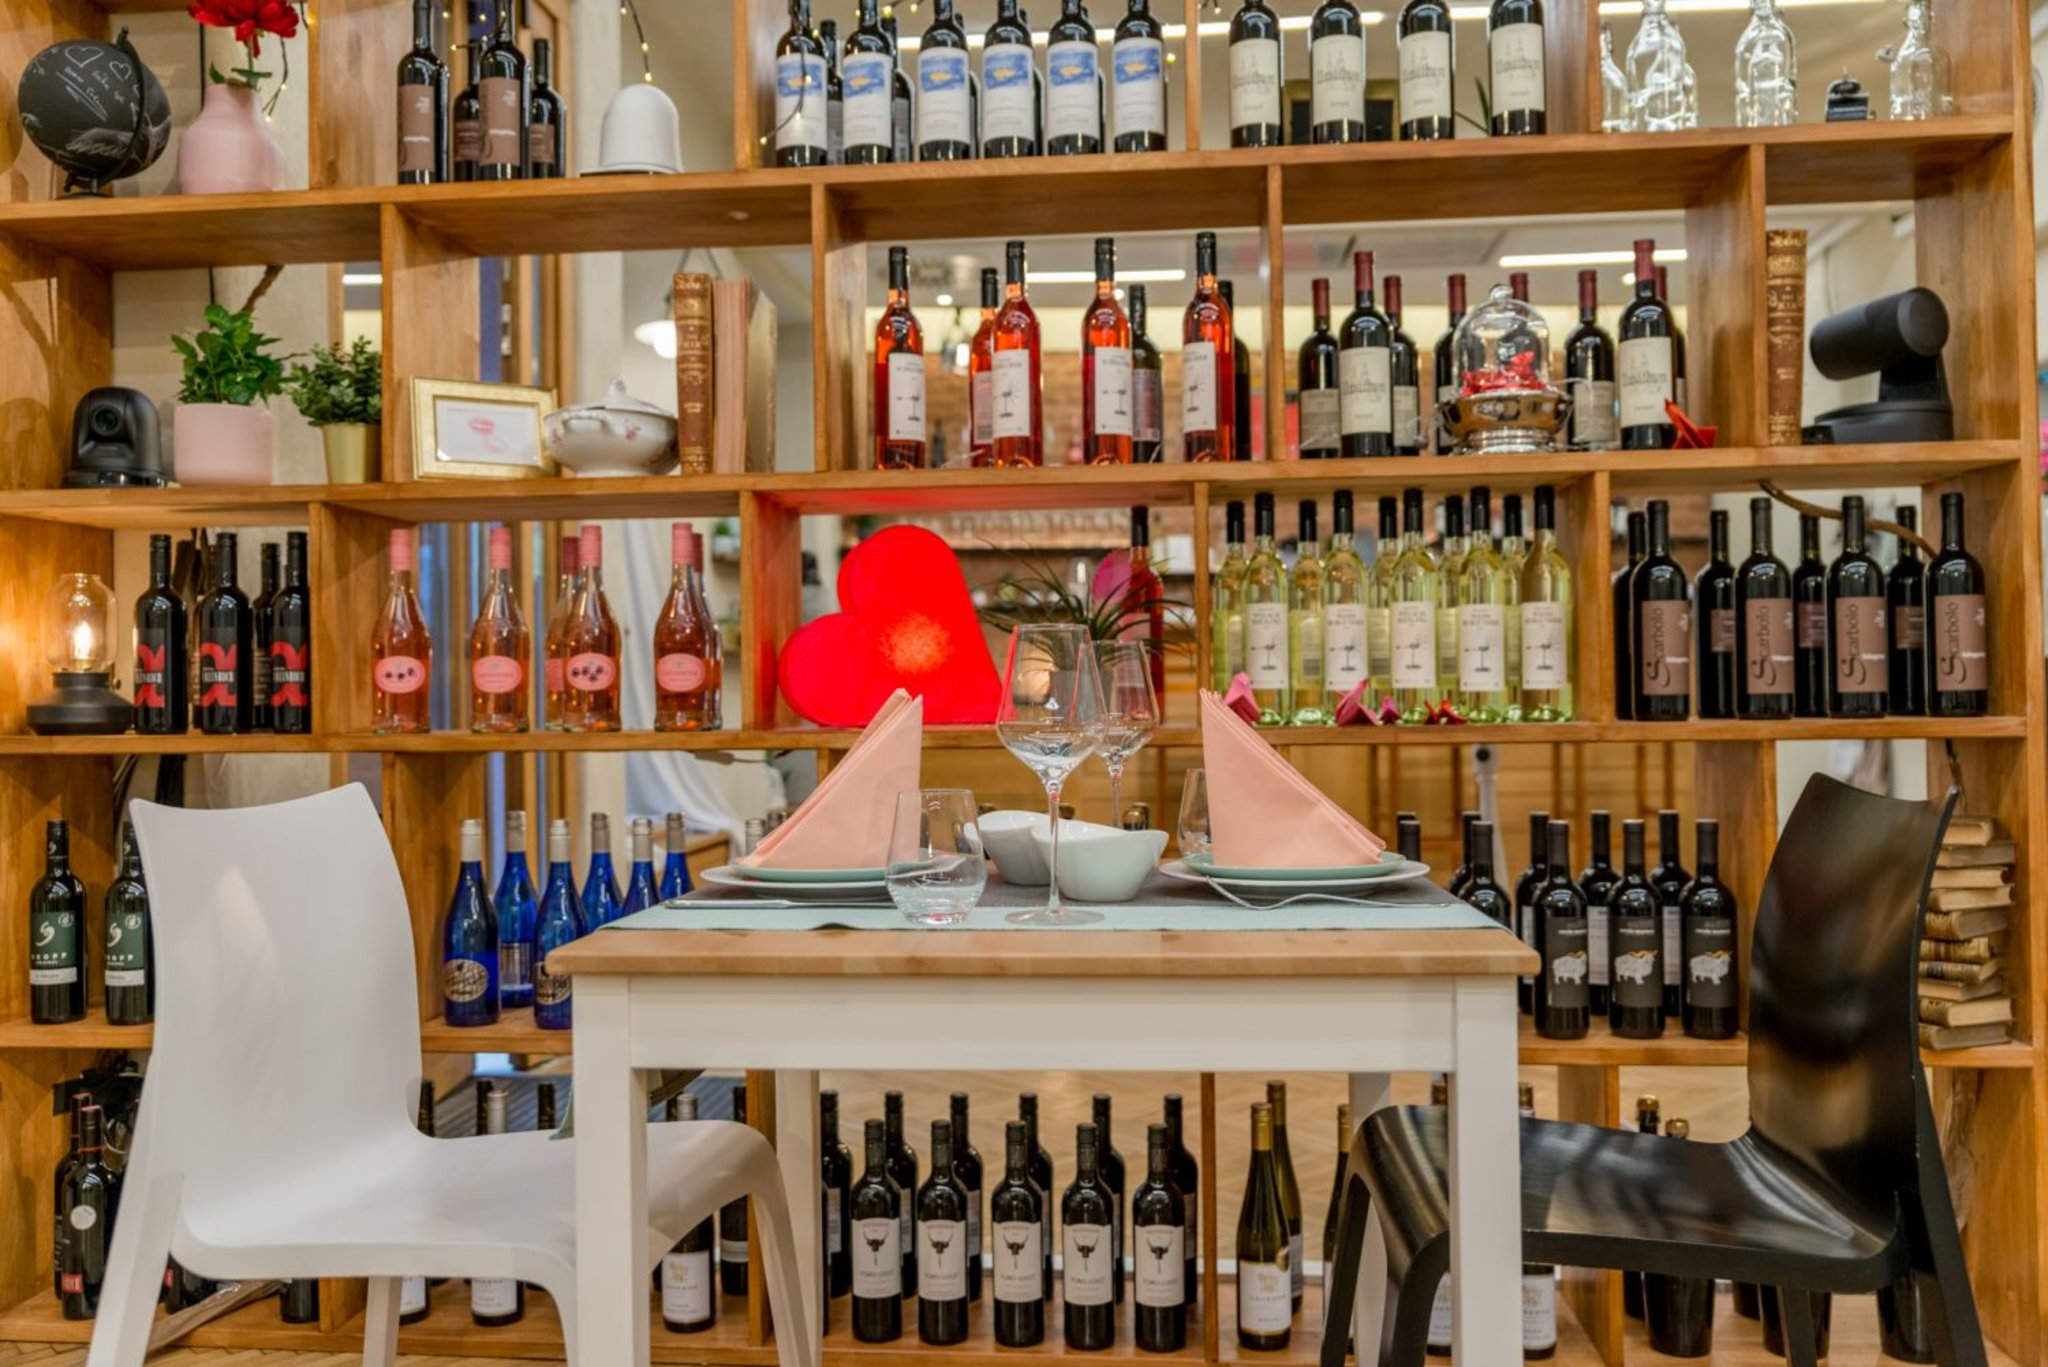 Single flirt in wallsee Markt erotik mlln